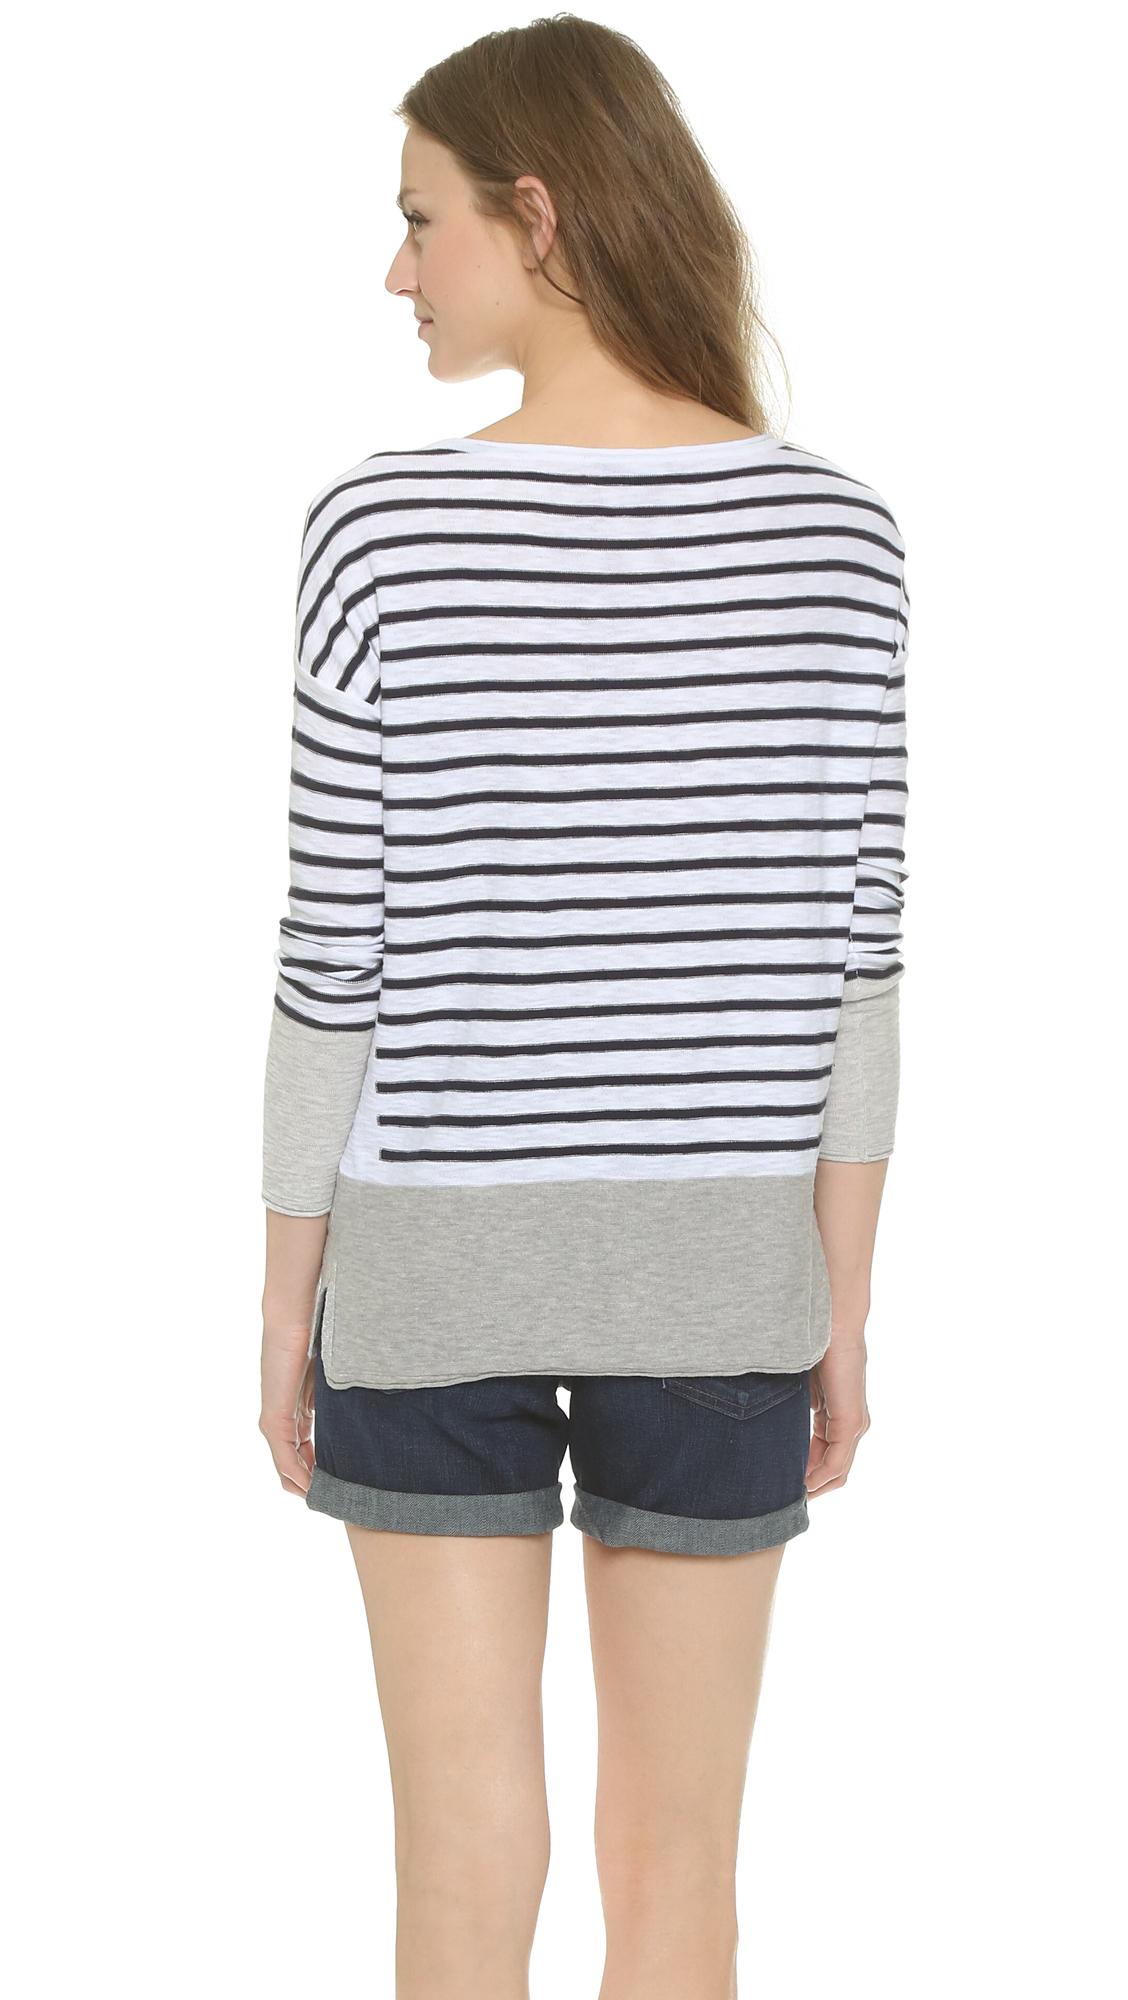 Vince Multi Stripe Boat Neck Sweater - Off White/Coastal Stripe in ...